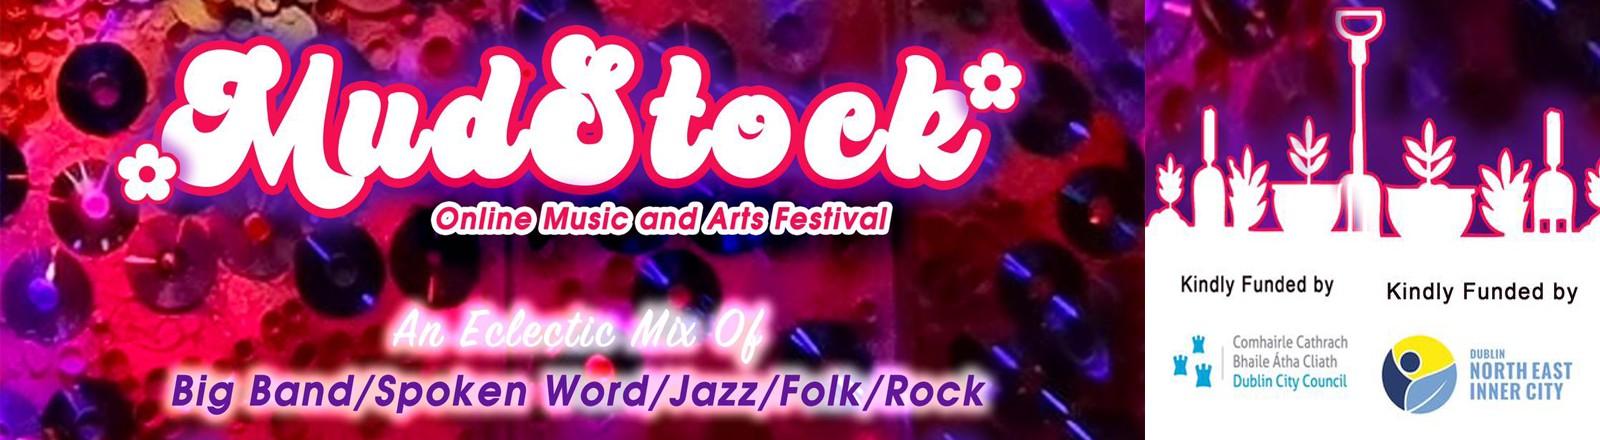 Mudstock Festival 2020